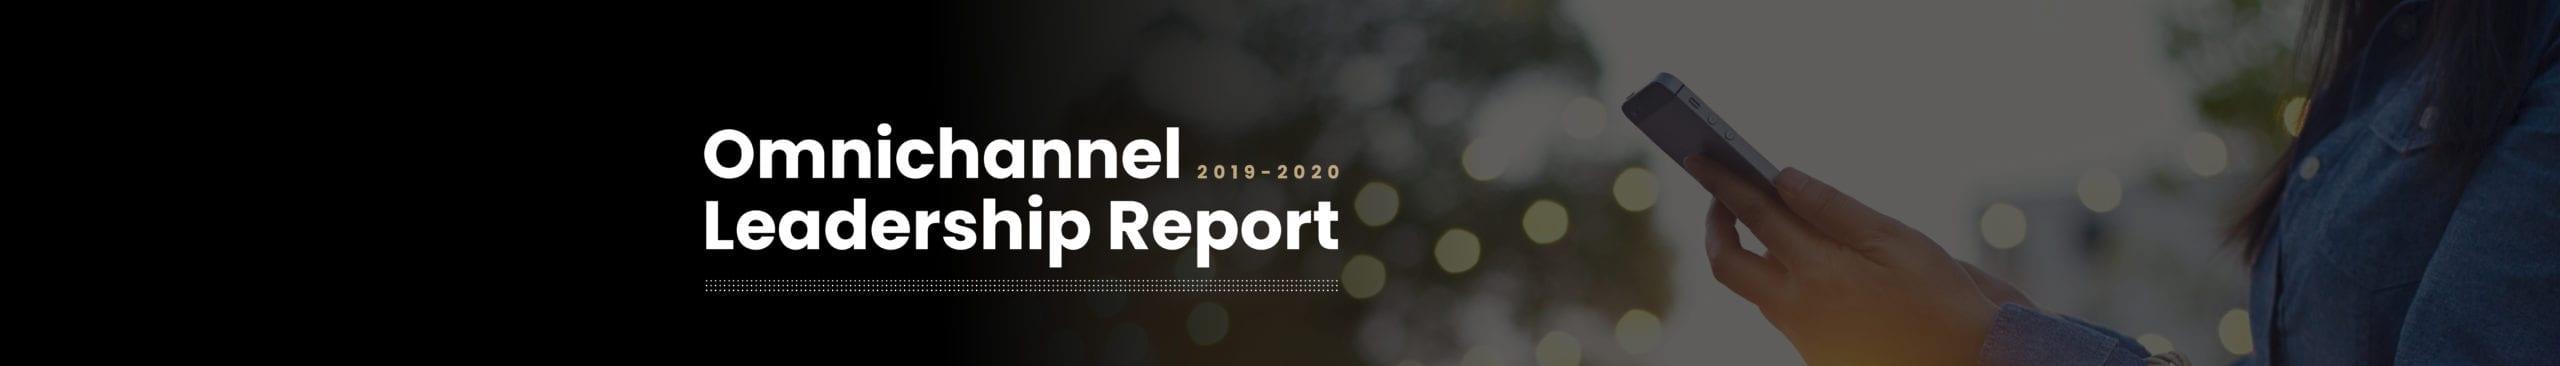 Omnichannel Leadership Report banner 2019-2020